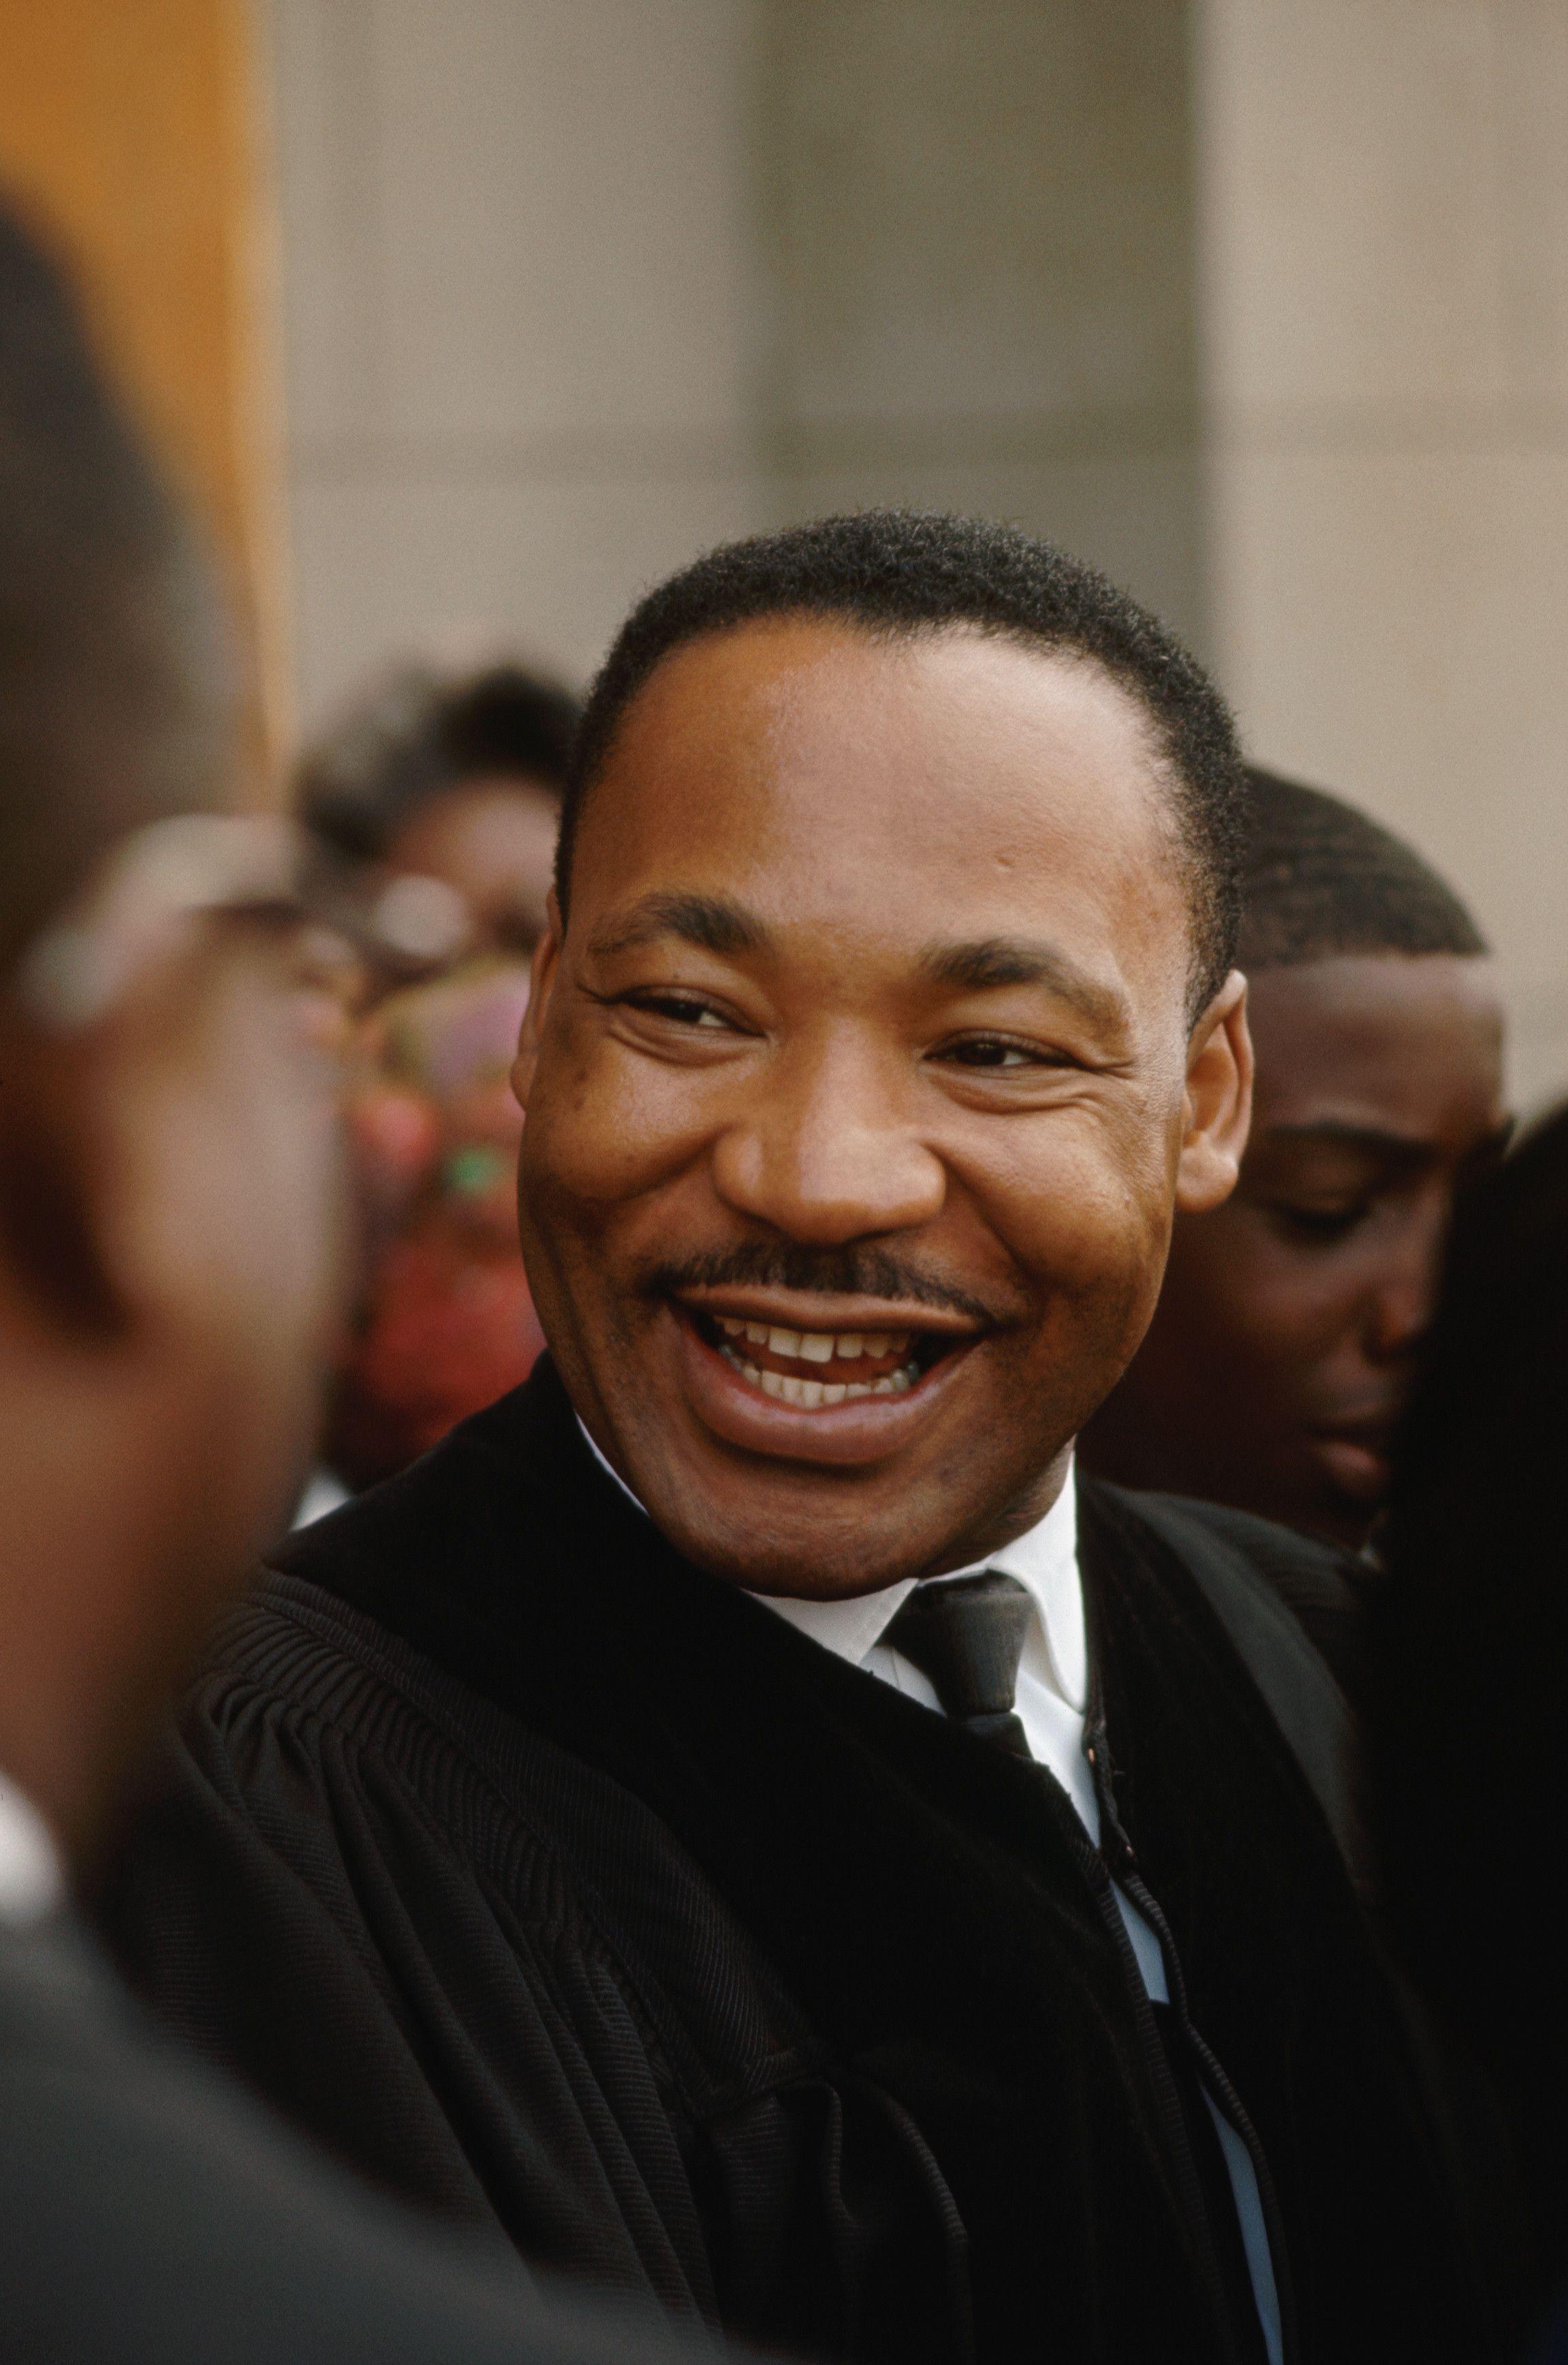 Martin Luther King Jr Civil Rights Civil Rights Leader Black